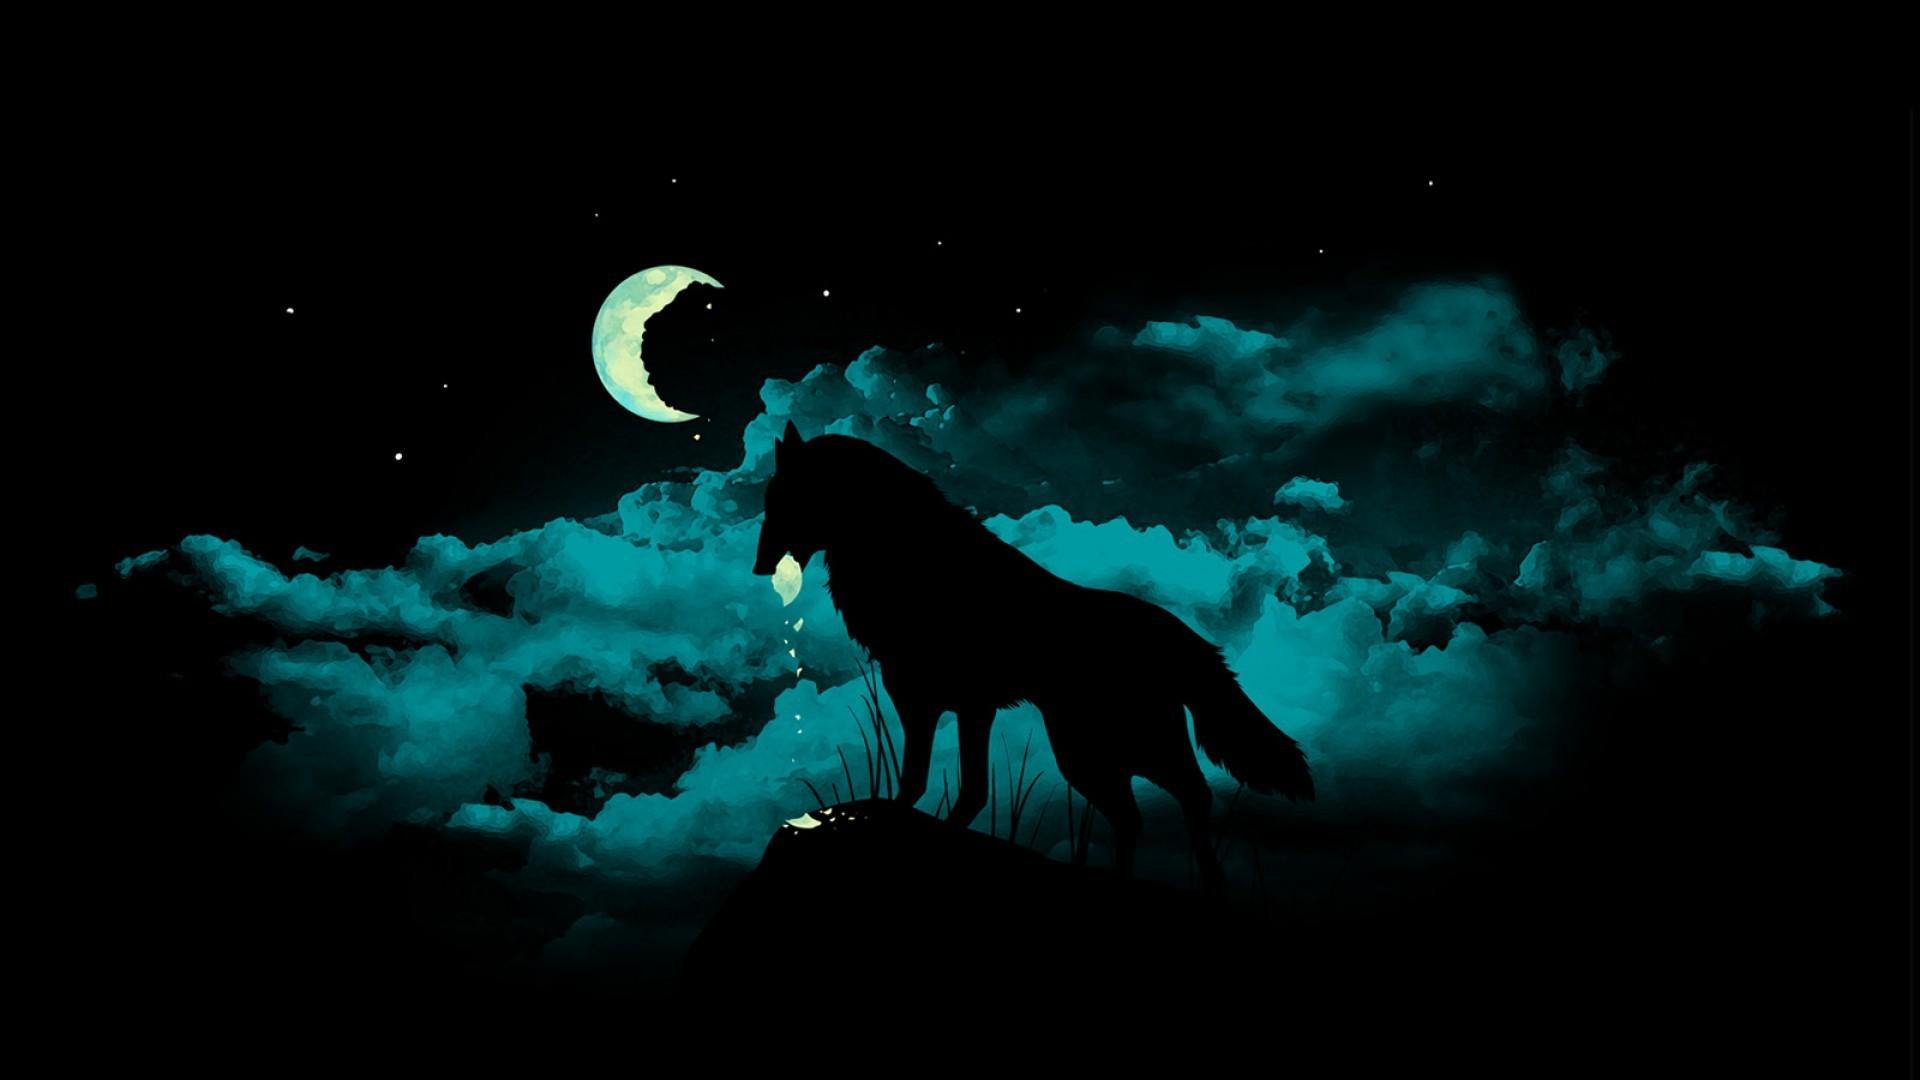 4K <b>Wolf Wallpaper</b> – WallpaperSafari